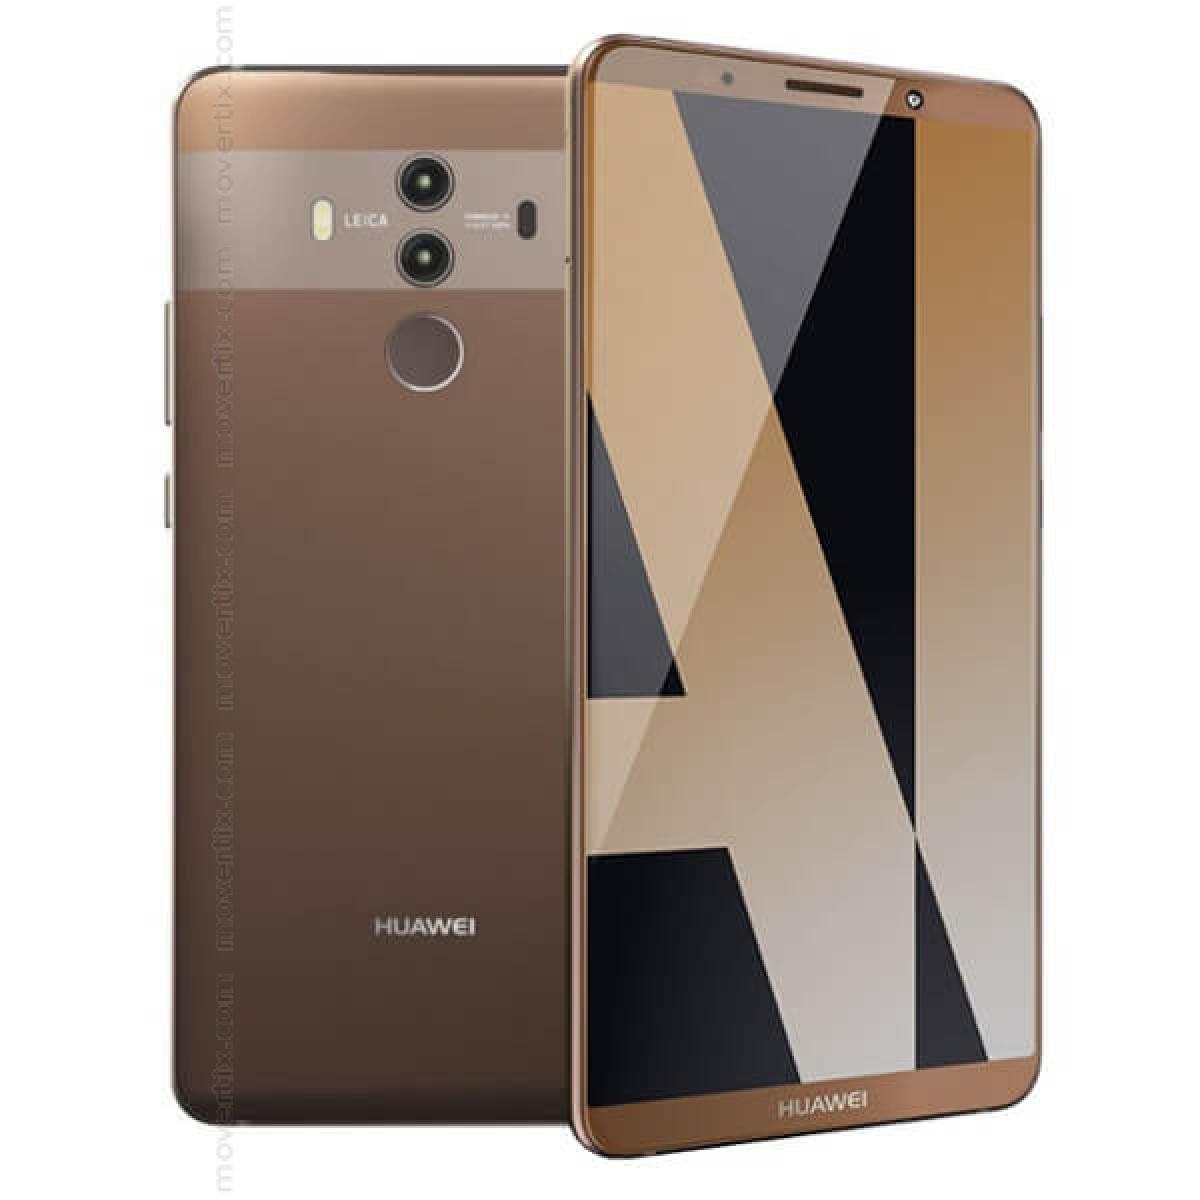 986a1e709b8 Huawei Mate 10 Pro Brown 128GB and 6GB RAM (6901443200016 ...